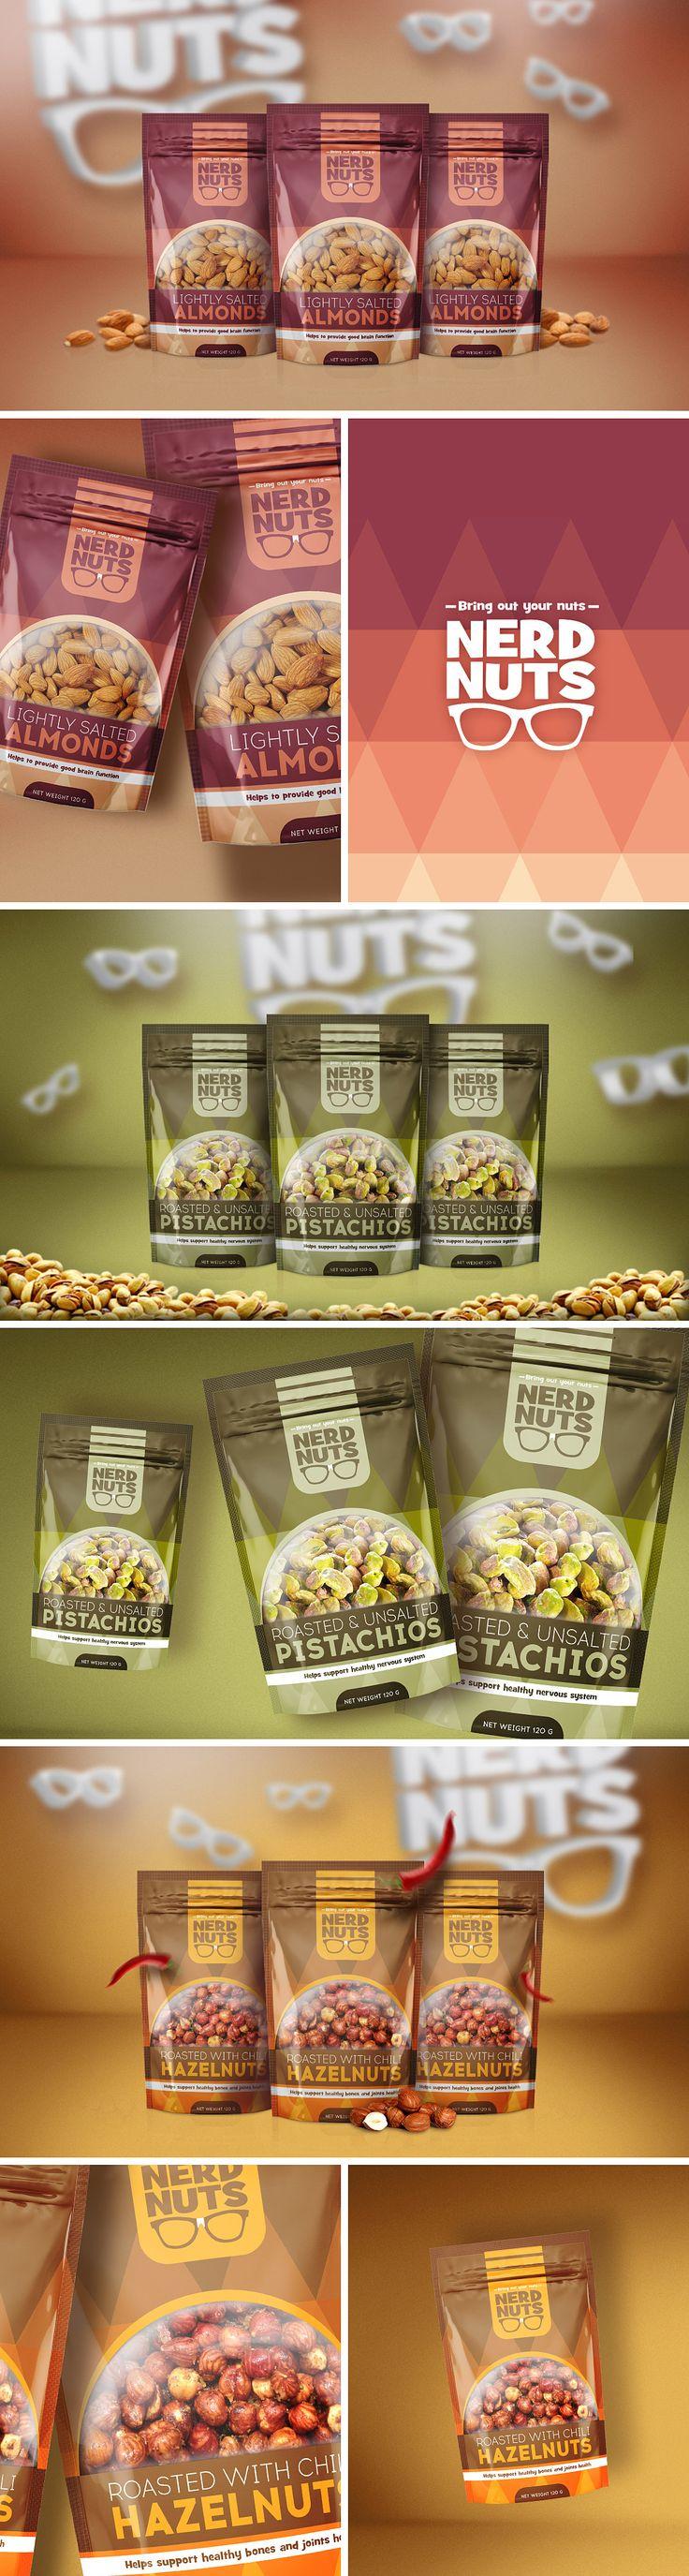 Nerd Nuts | Packaging Design